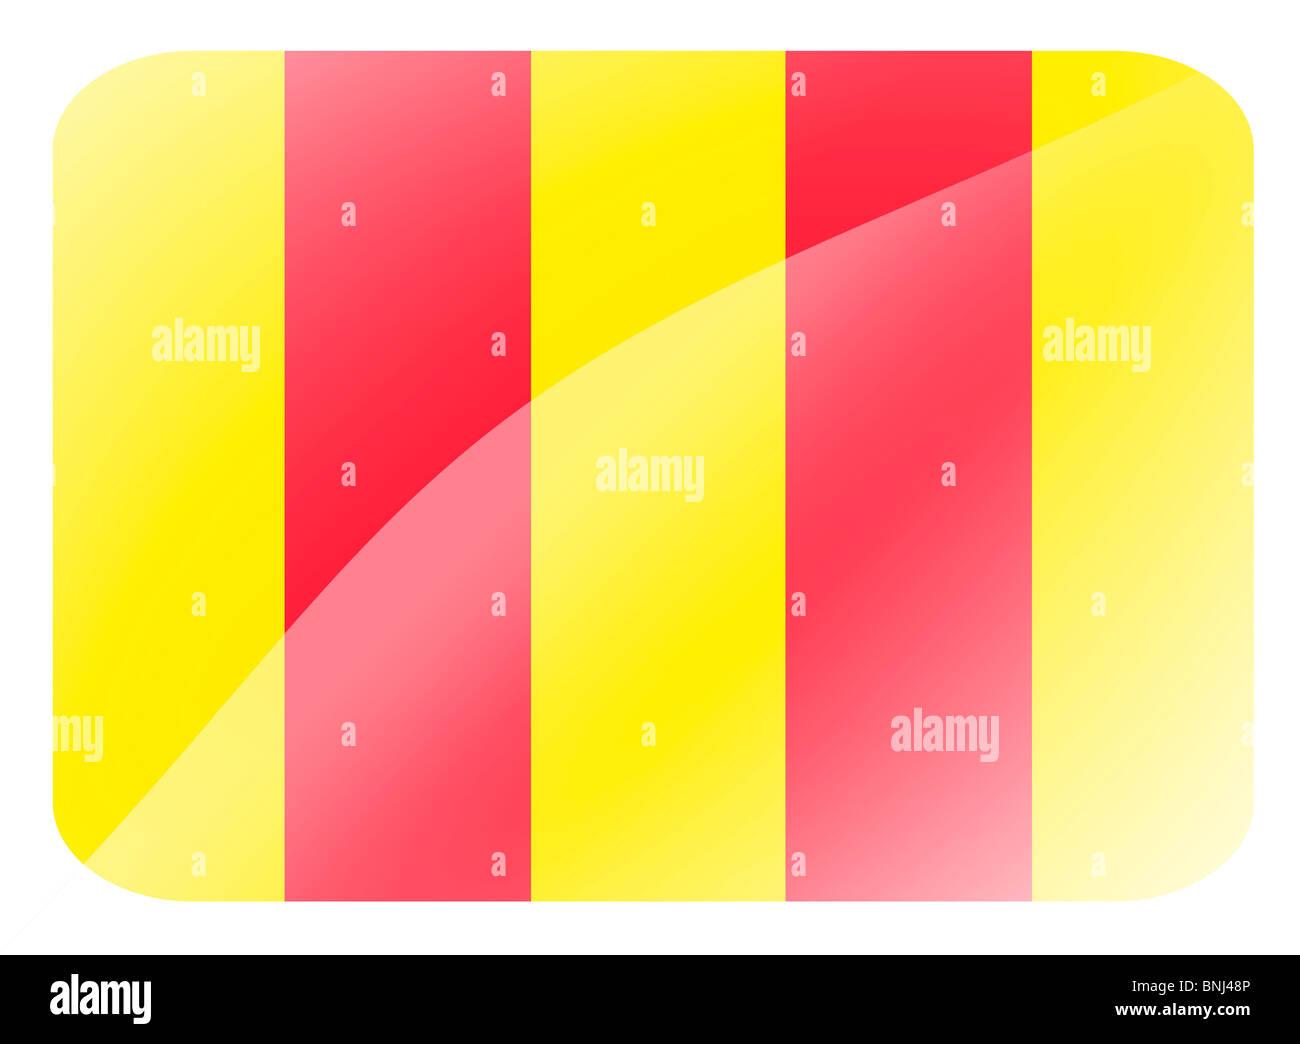 Slippery track flag -F1 Grand Prix - Stock Image